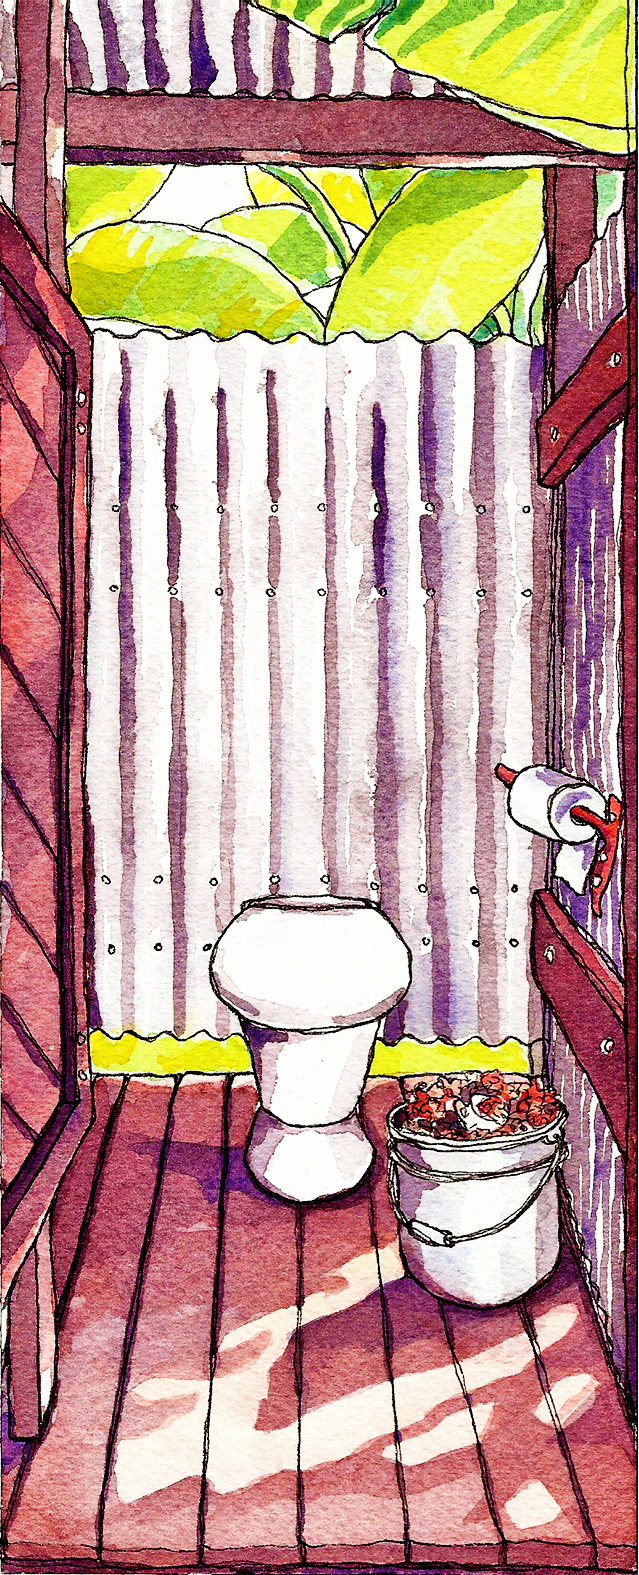 compost toilet2.jpg